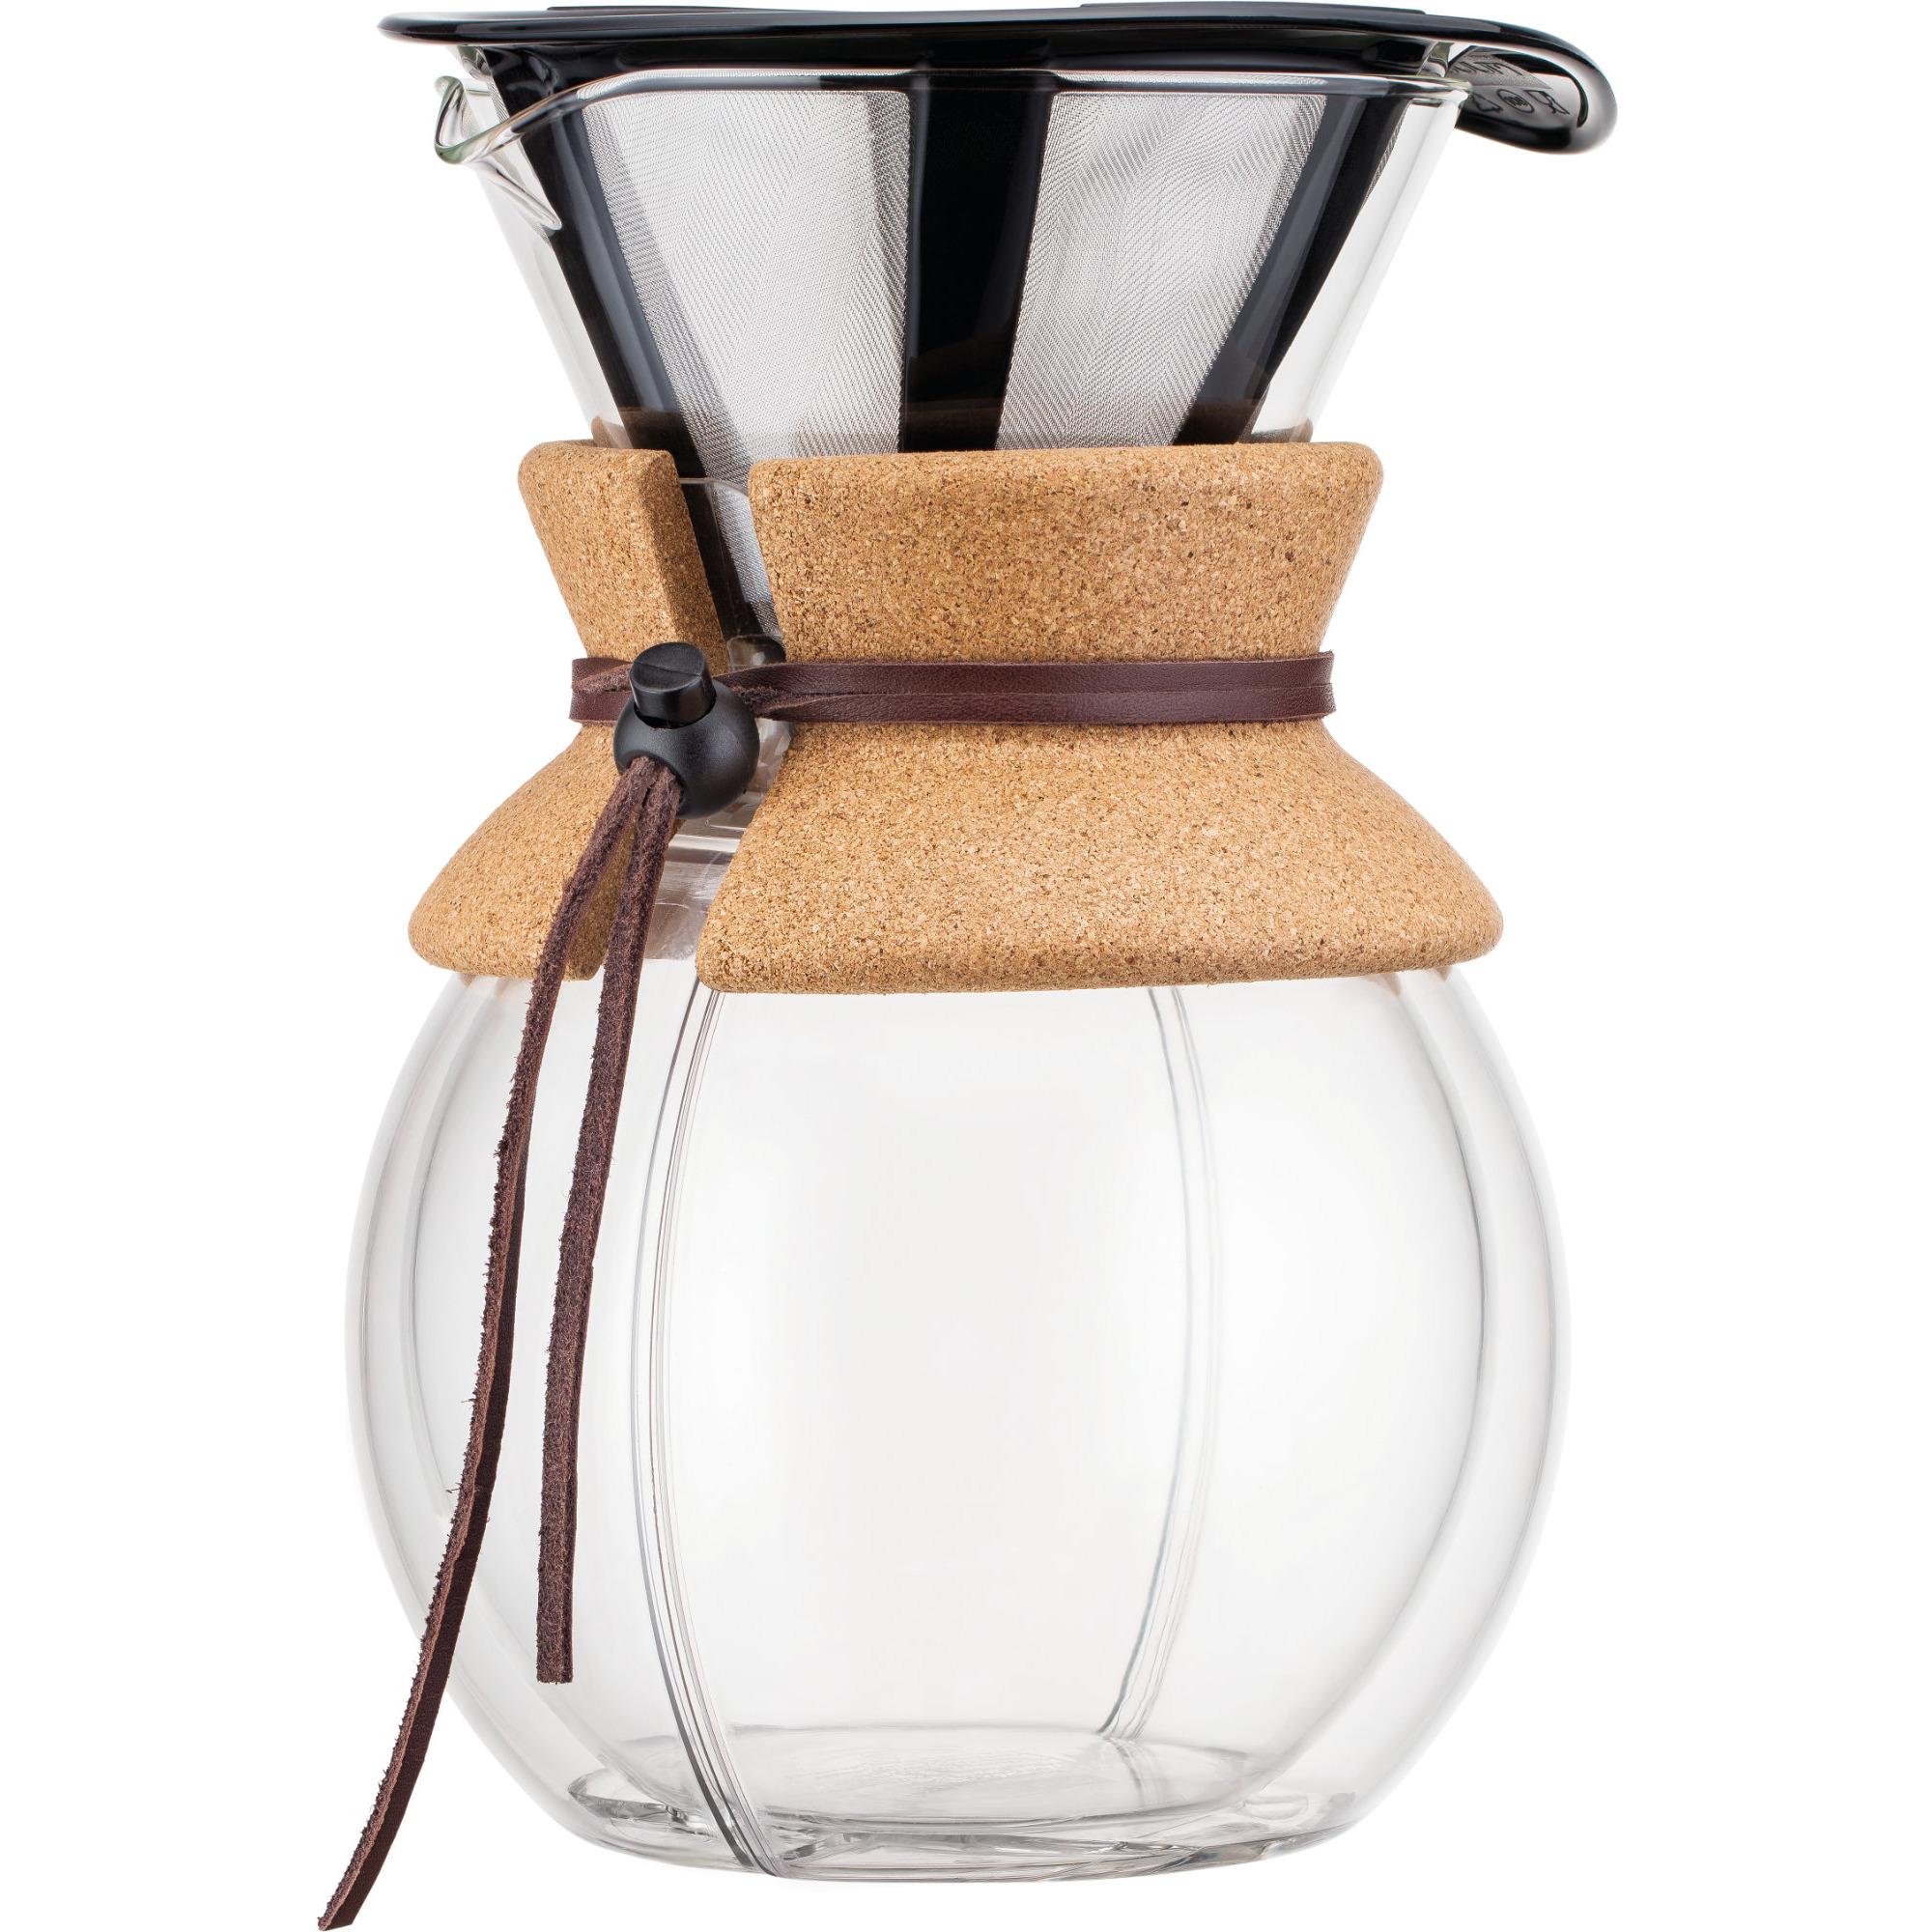 Bodum Pour Over Dubbelvägg Kork med Filter 1 l